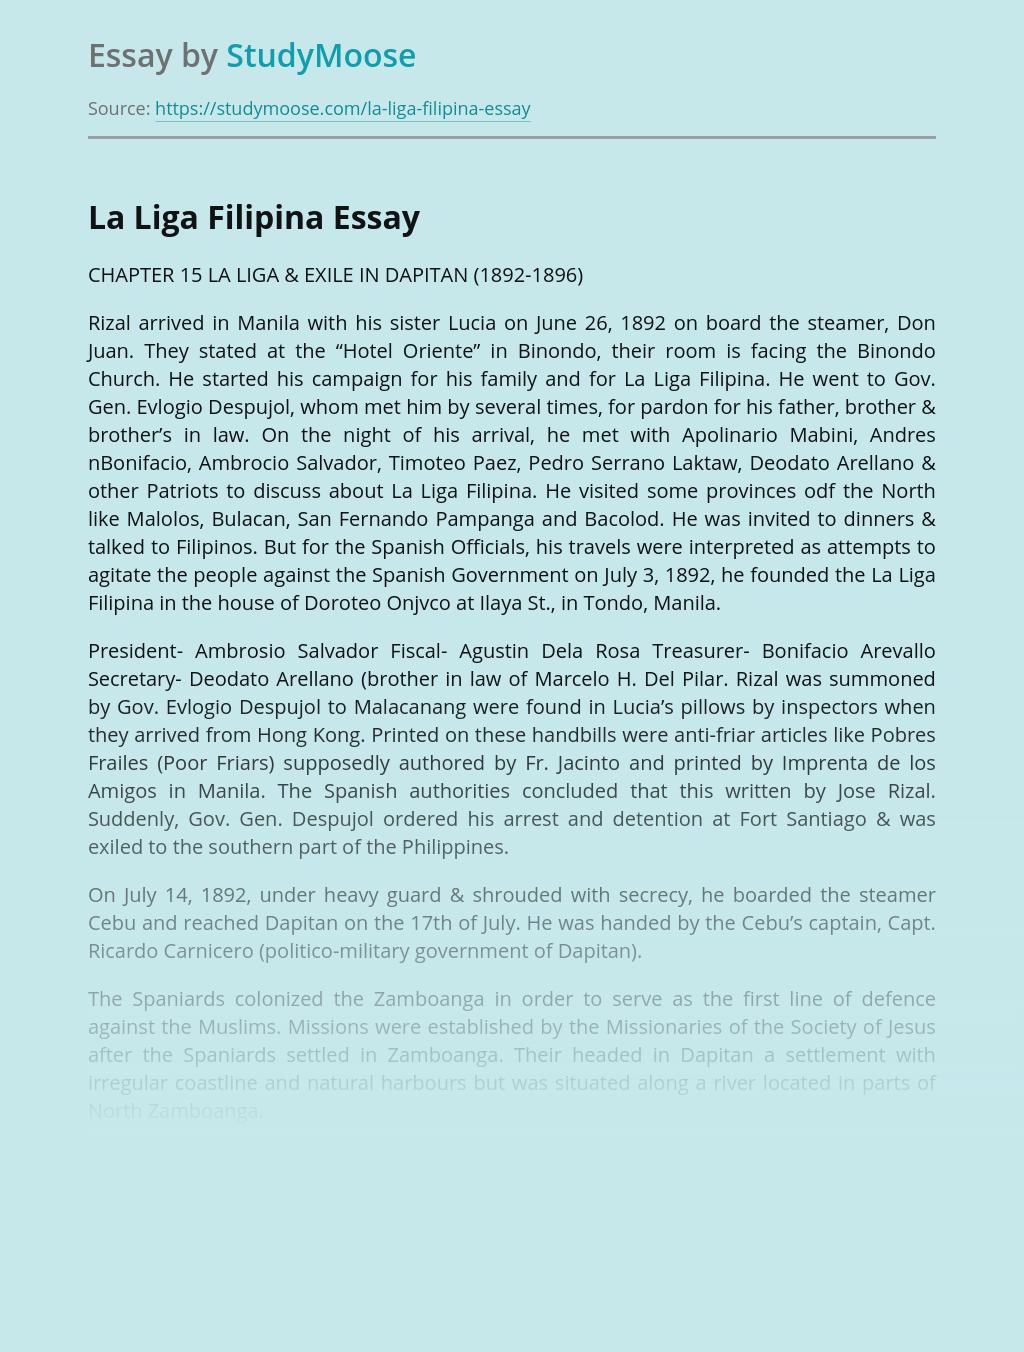 Persona of Rizal and La Liga Filipina